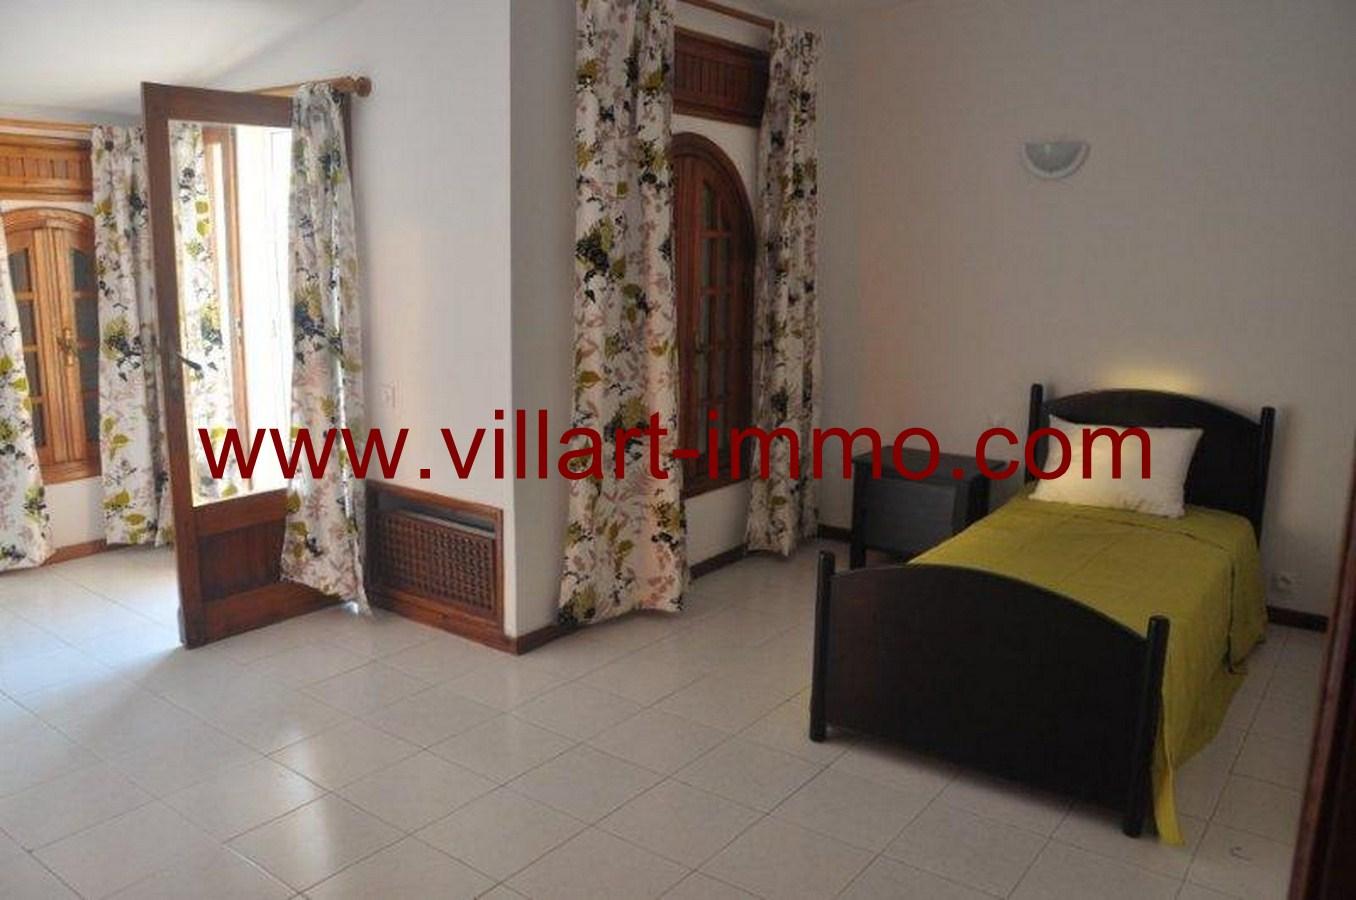 12-Location-Villa-Meublé-Malabata-Chambre 3-Villart immo-Tanger-LV126